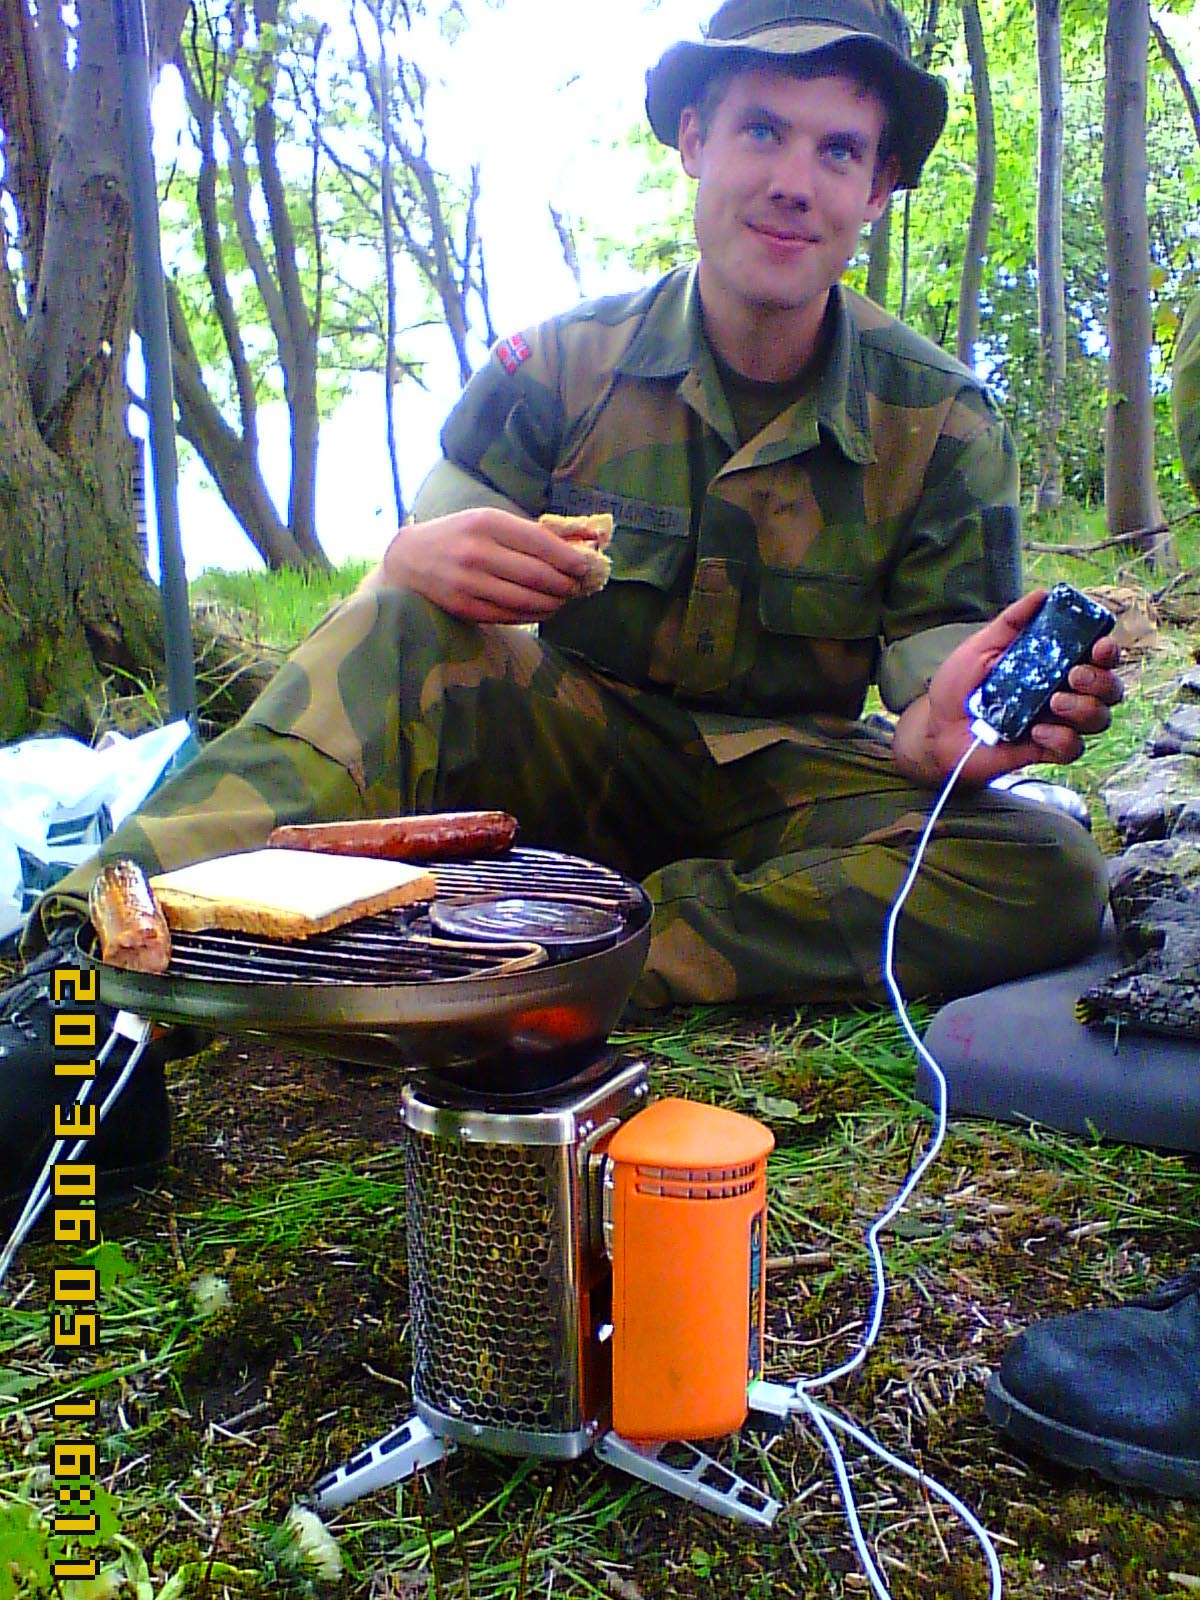 NorwegianHomeGuardBioLite.jpg